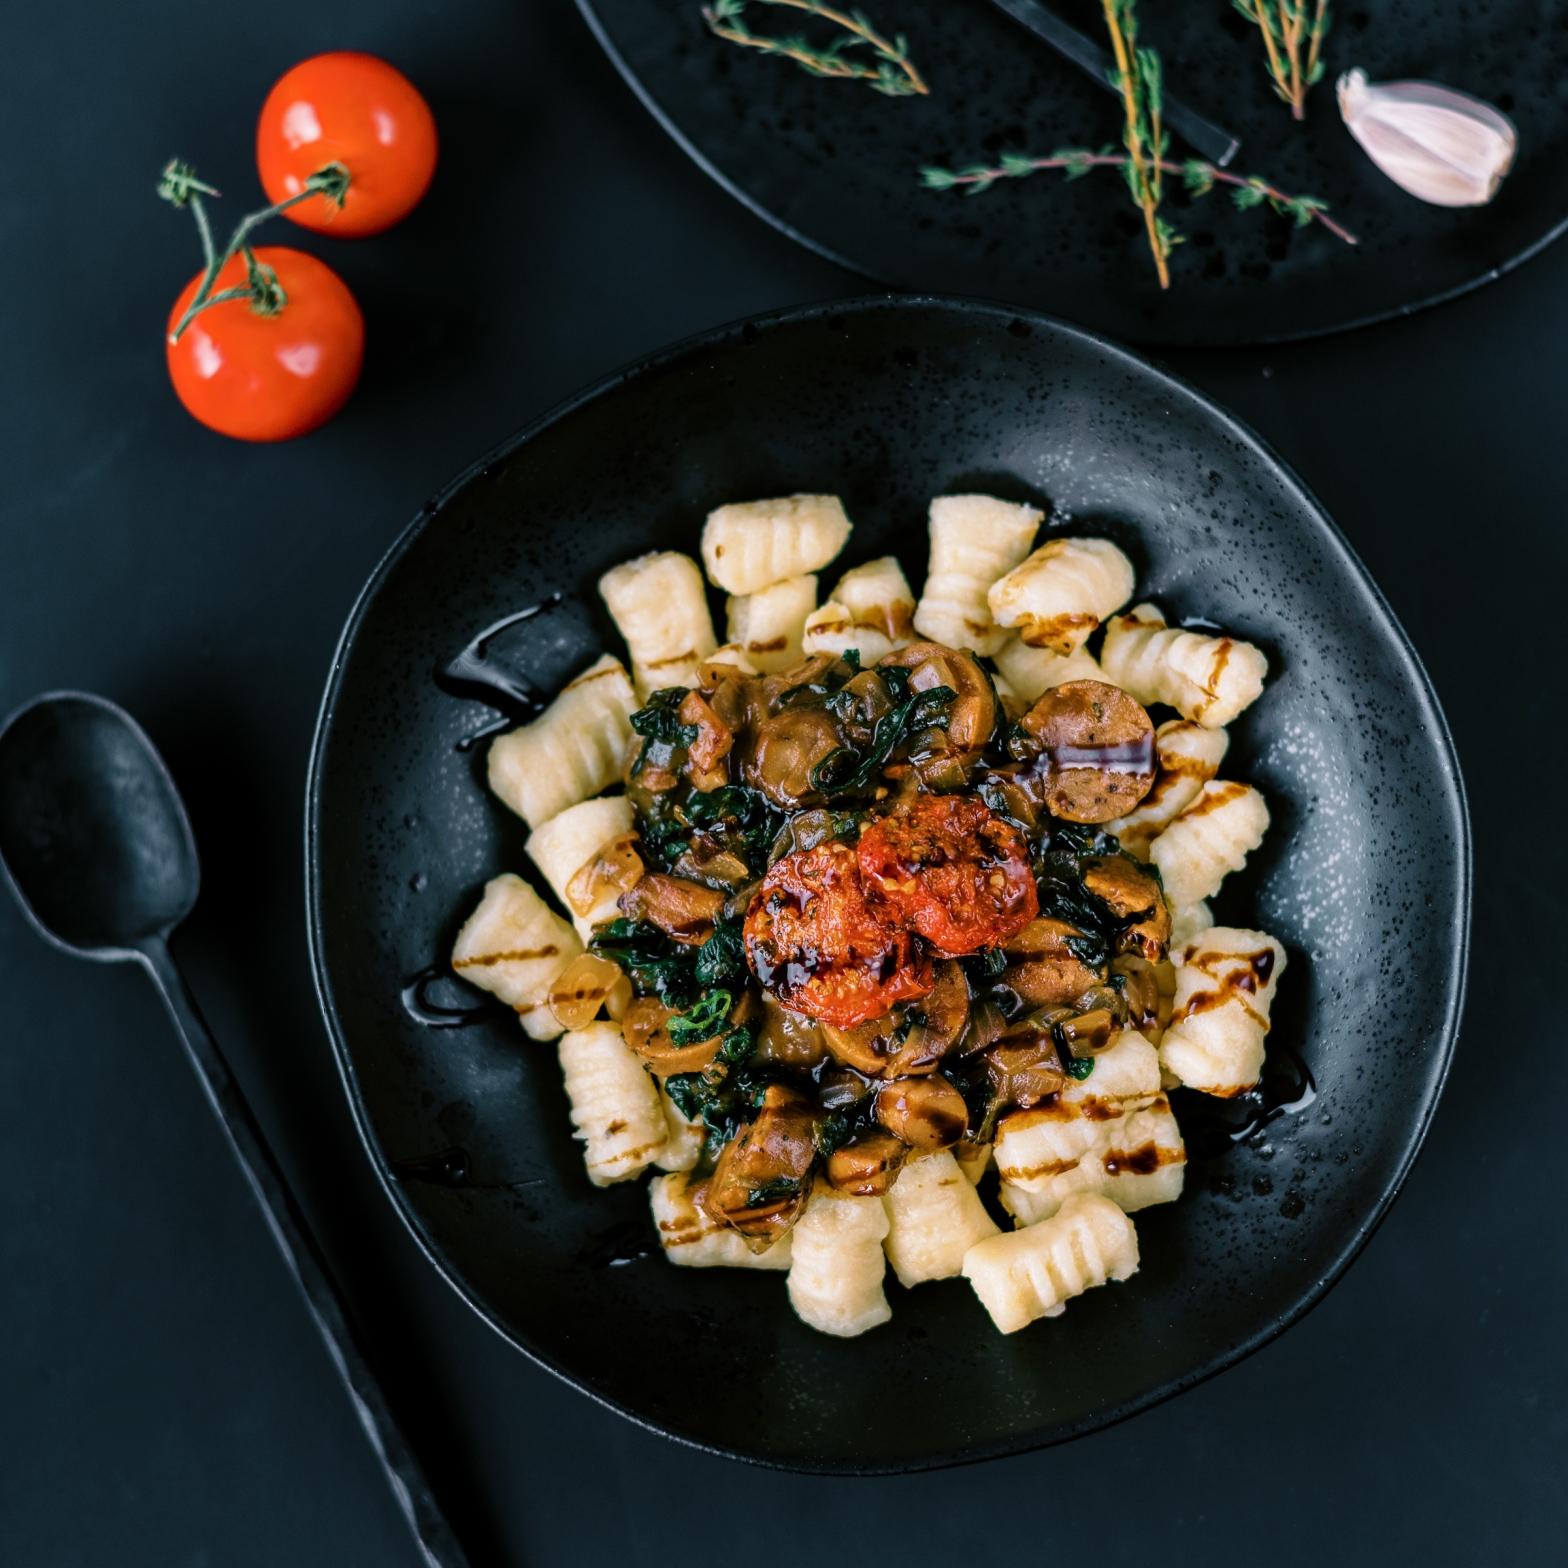 Vegan Gnocchi with Balsamic Mushroom Sauce